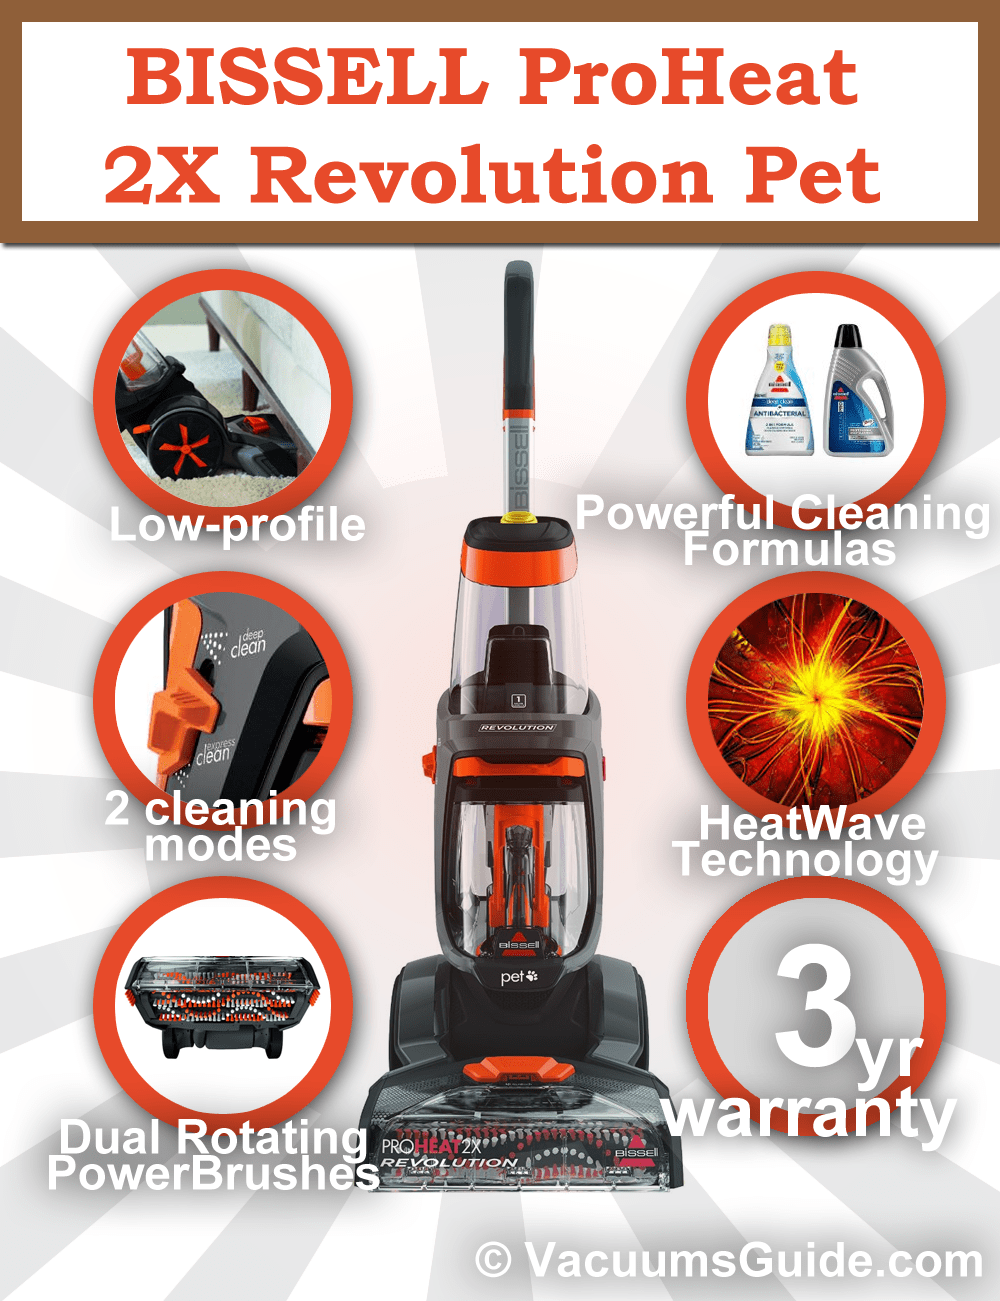 Bissell ProHeat 2X Revolution Pet 1548 carpet cleaner